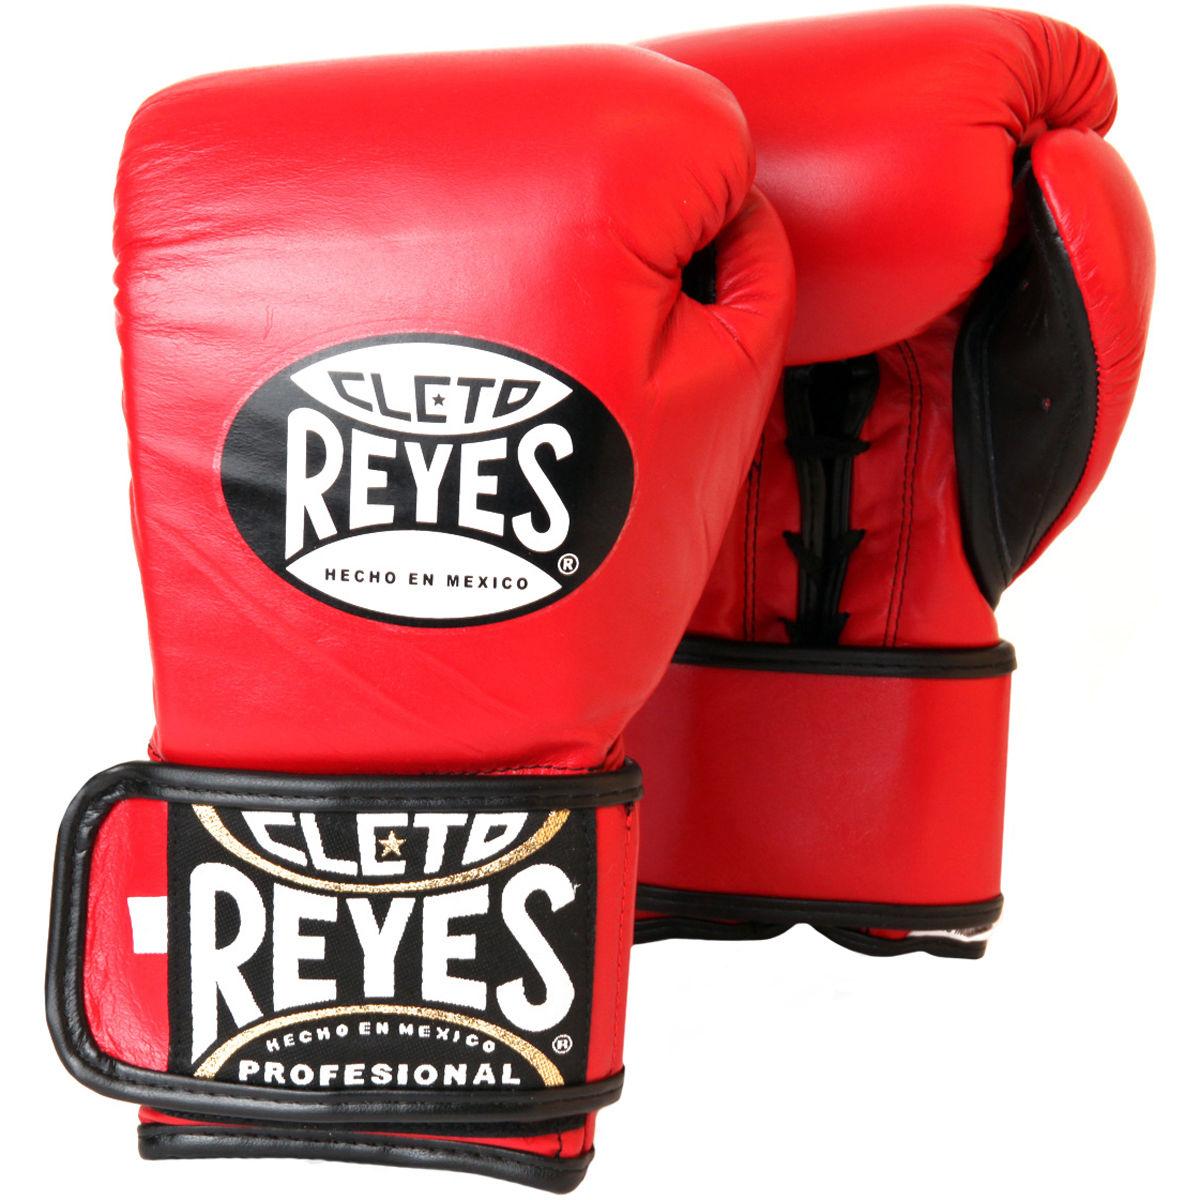 REYES レイジェス ボクシング グローブ ボクシンググローブ レッド 赤 メキシコ製 本革 6オンス 10オンス 14オンス 18オンス